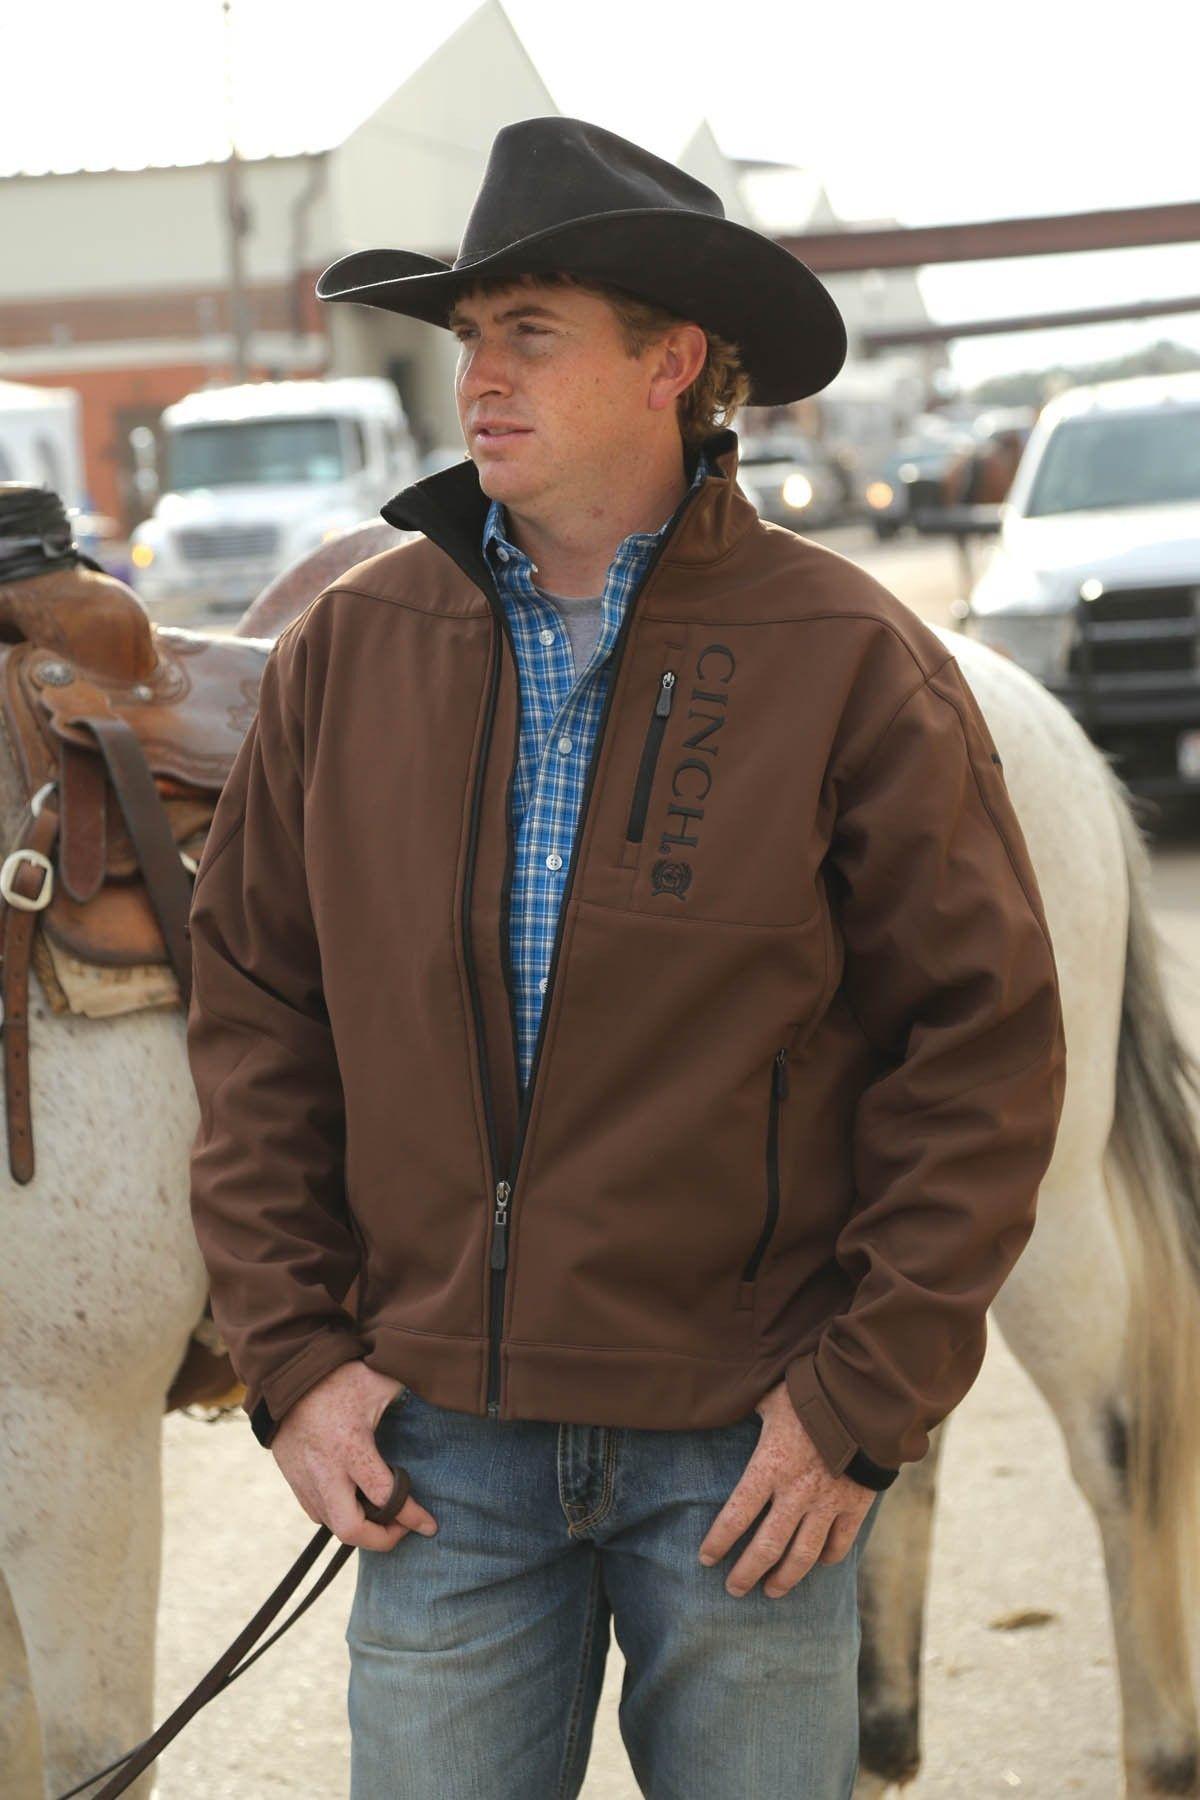 Cowboy S Sport Coats Jackets Eli S Western Wear Cinch Clothing Cowboy Outfit For Men Bonded Jacket [ 1800 x 1200 Pixel ]